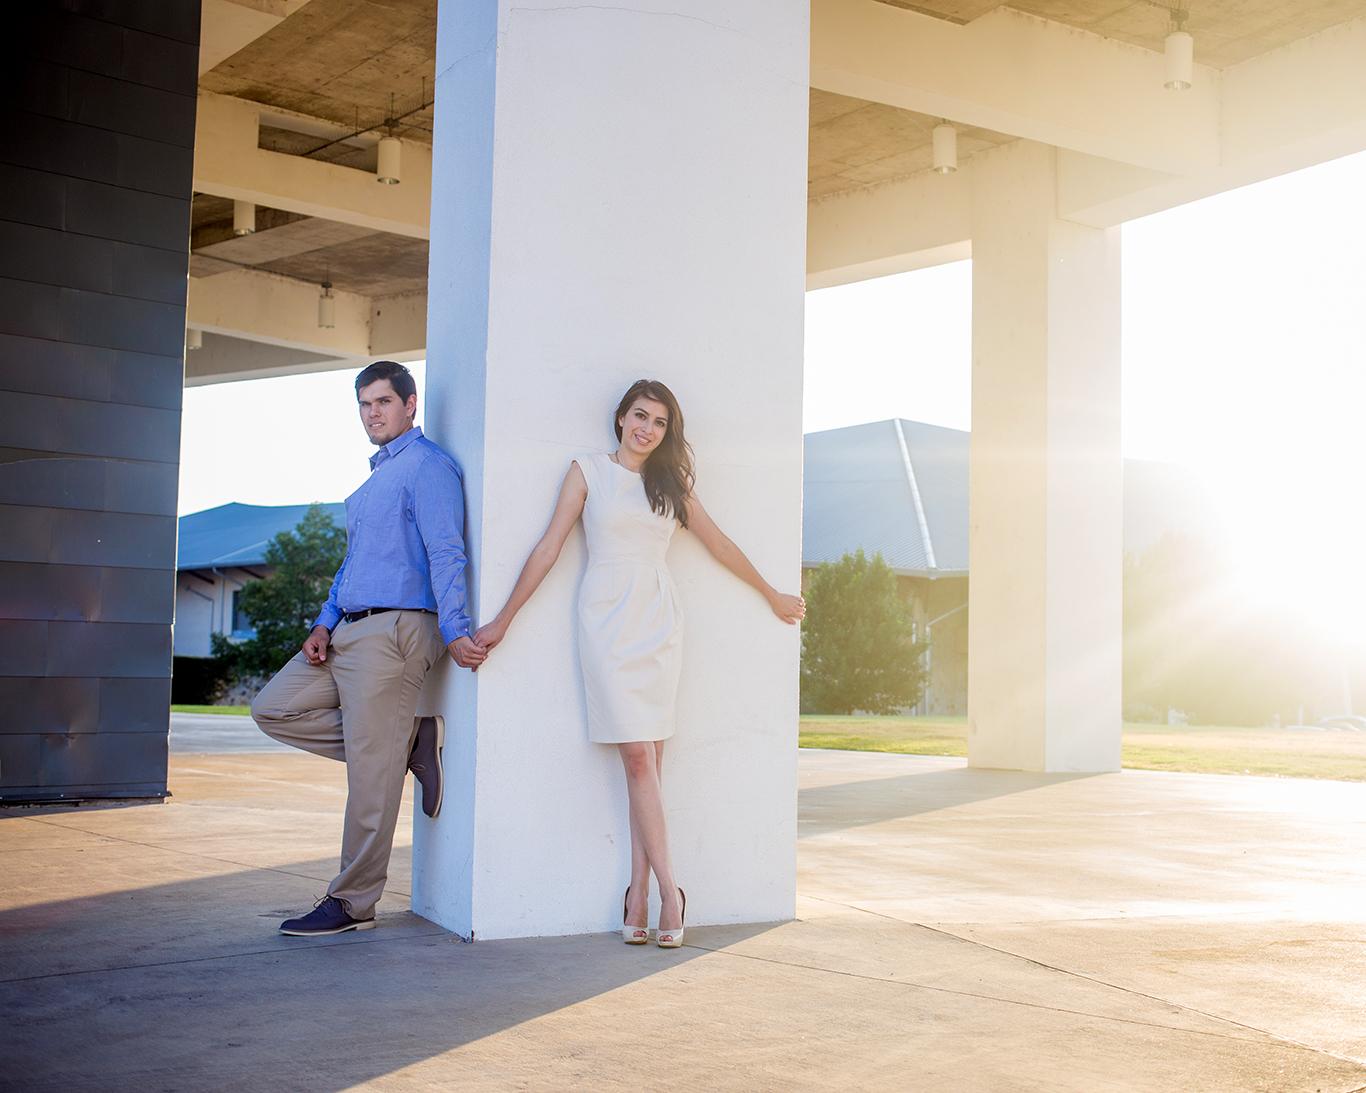 austin engagement photo shoot